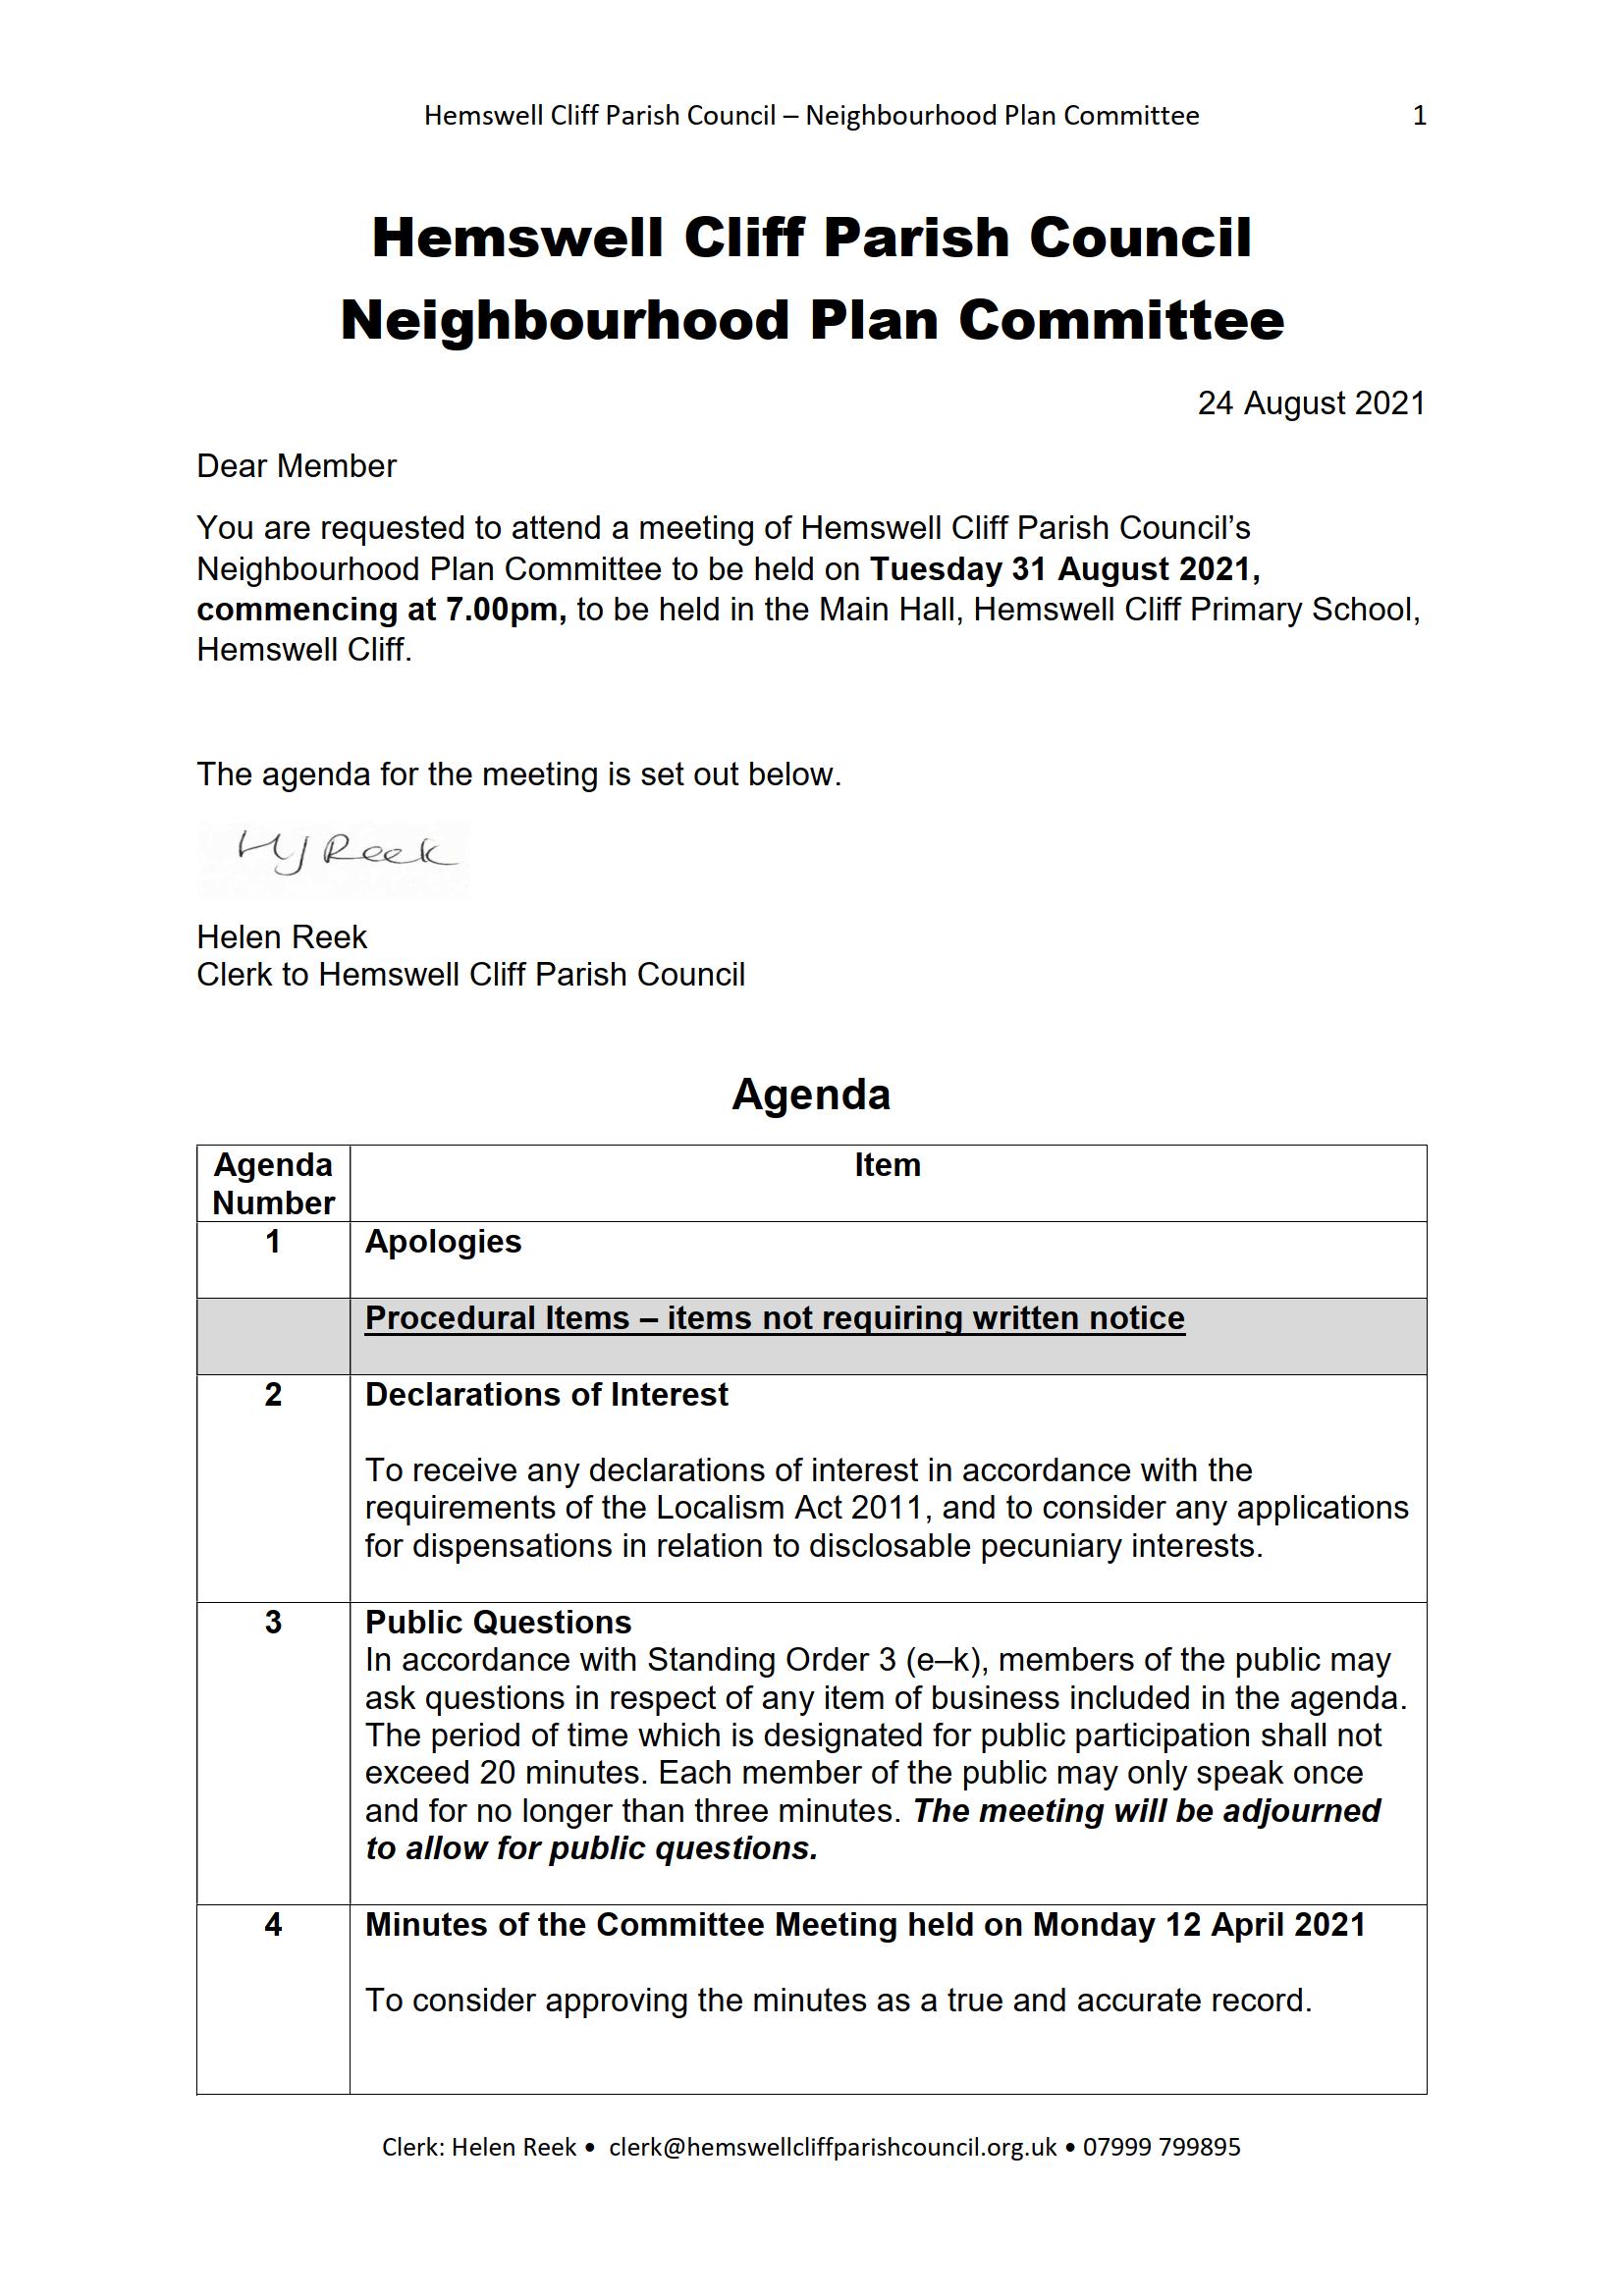 HCPC_NPC_Agenda_31.08.21_1.png